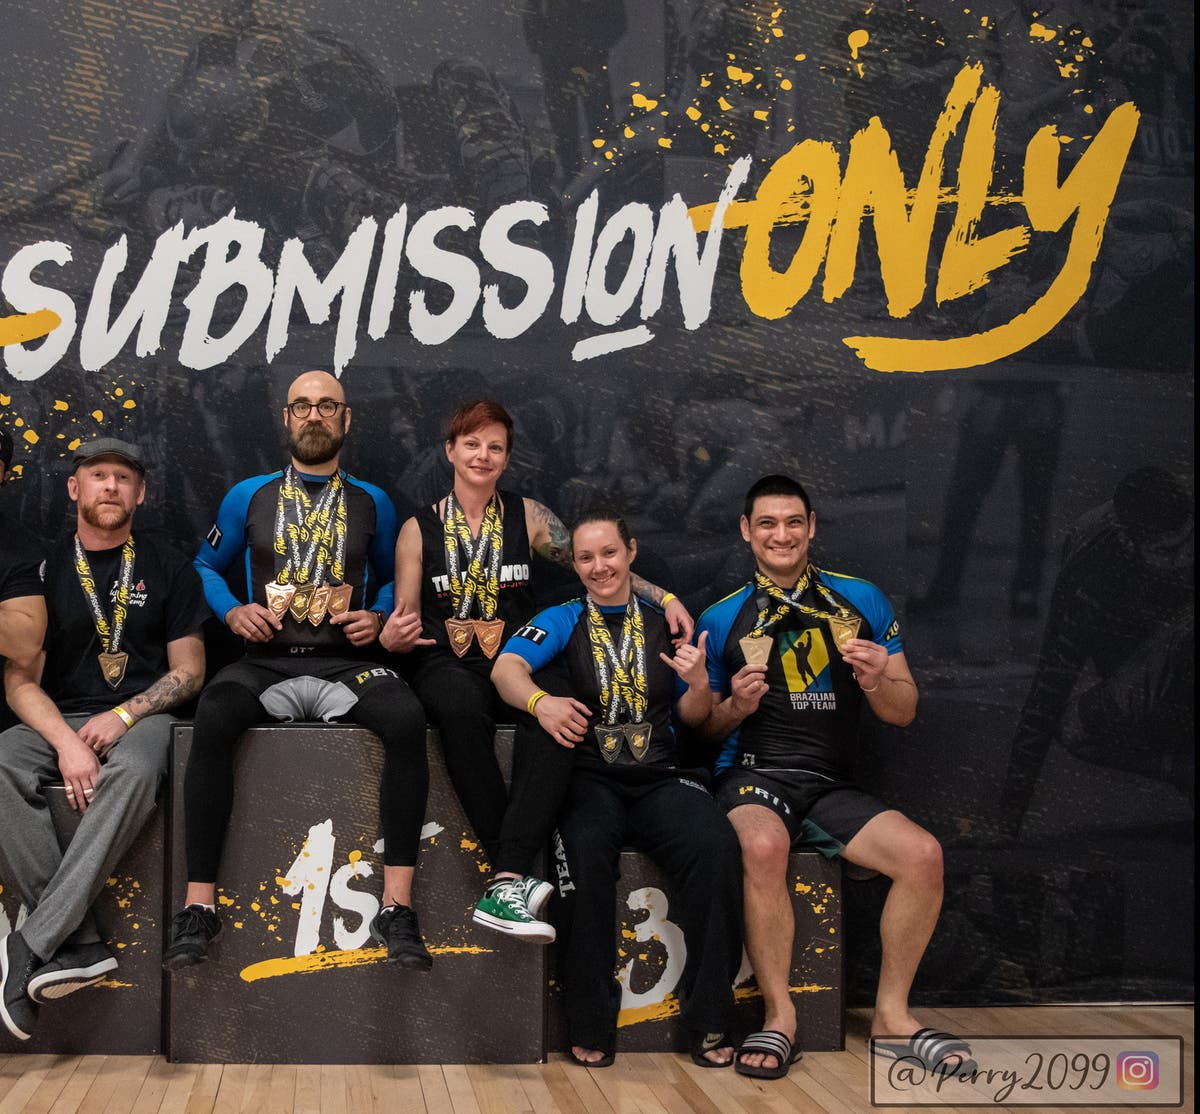 5 Team Woo Brazilian Jiu Jitsu Fighters Bring Home 11 medals